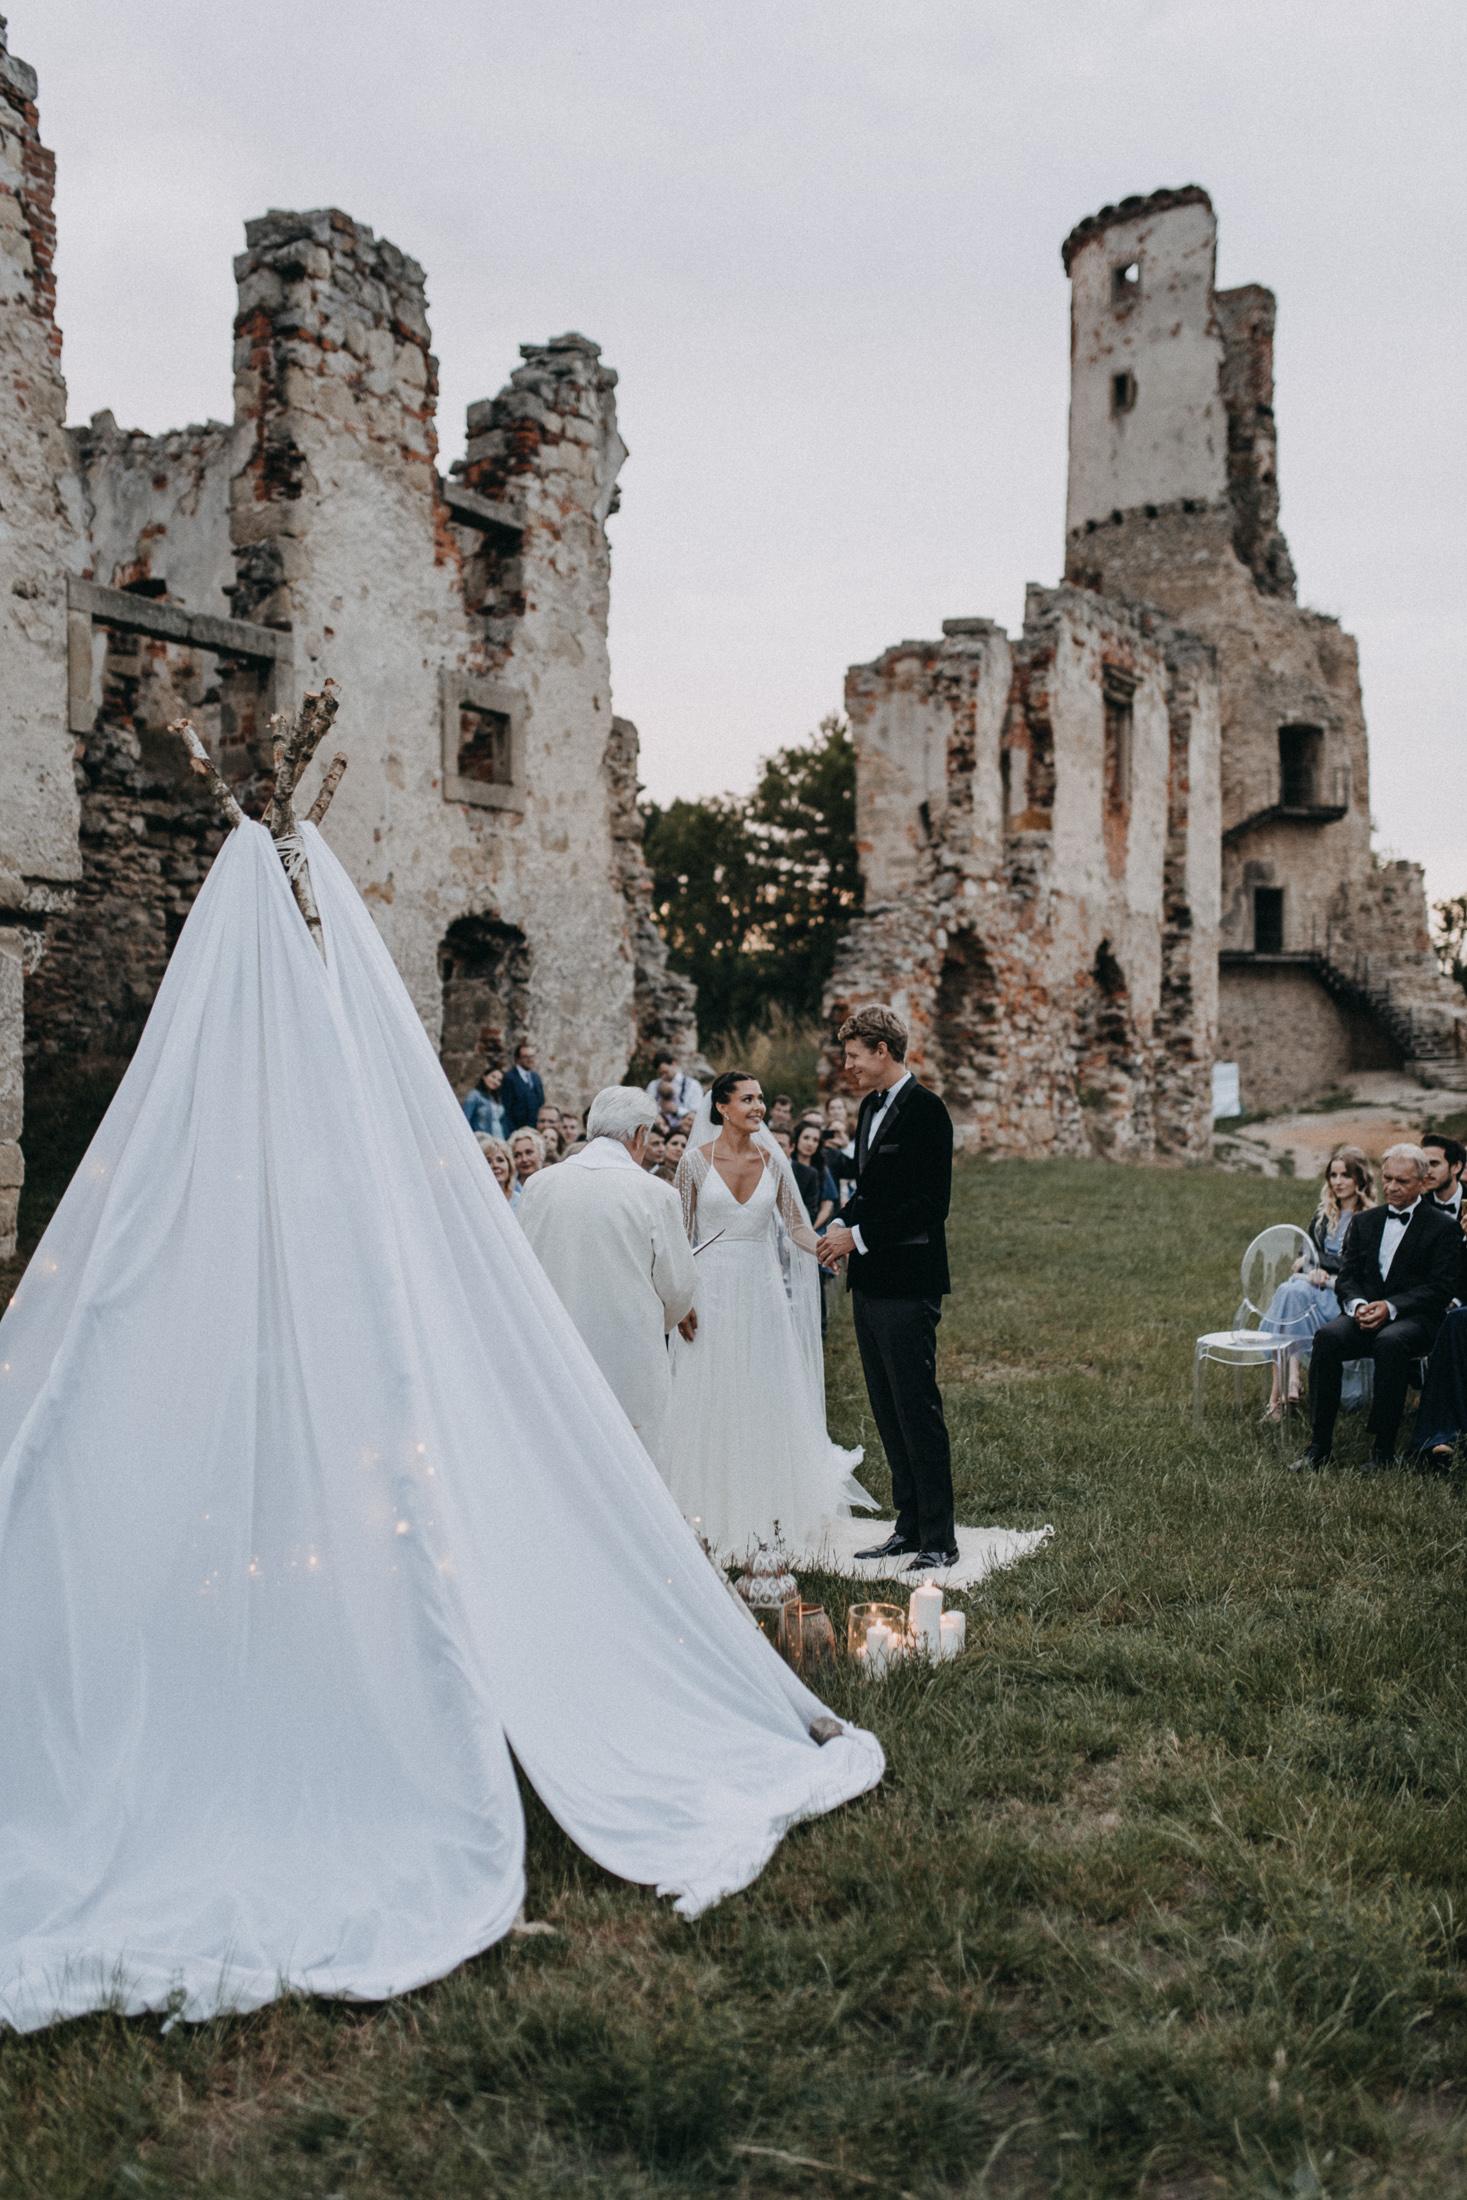 castle ruins wedding evening ceremony